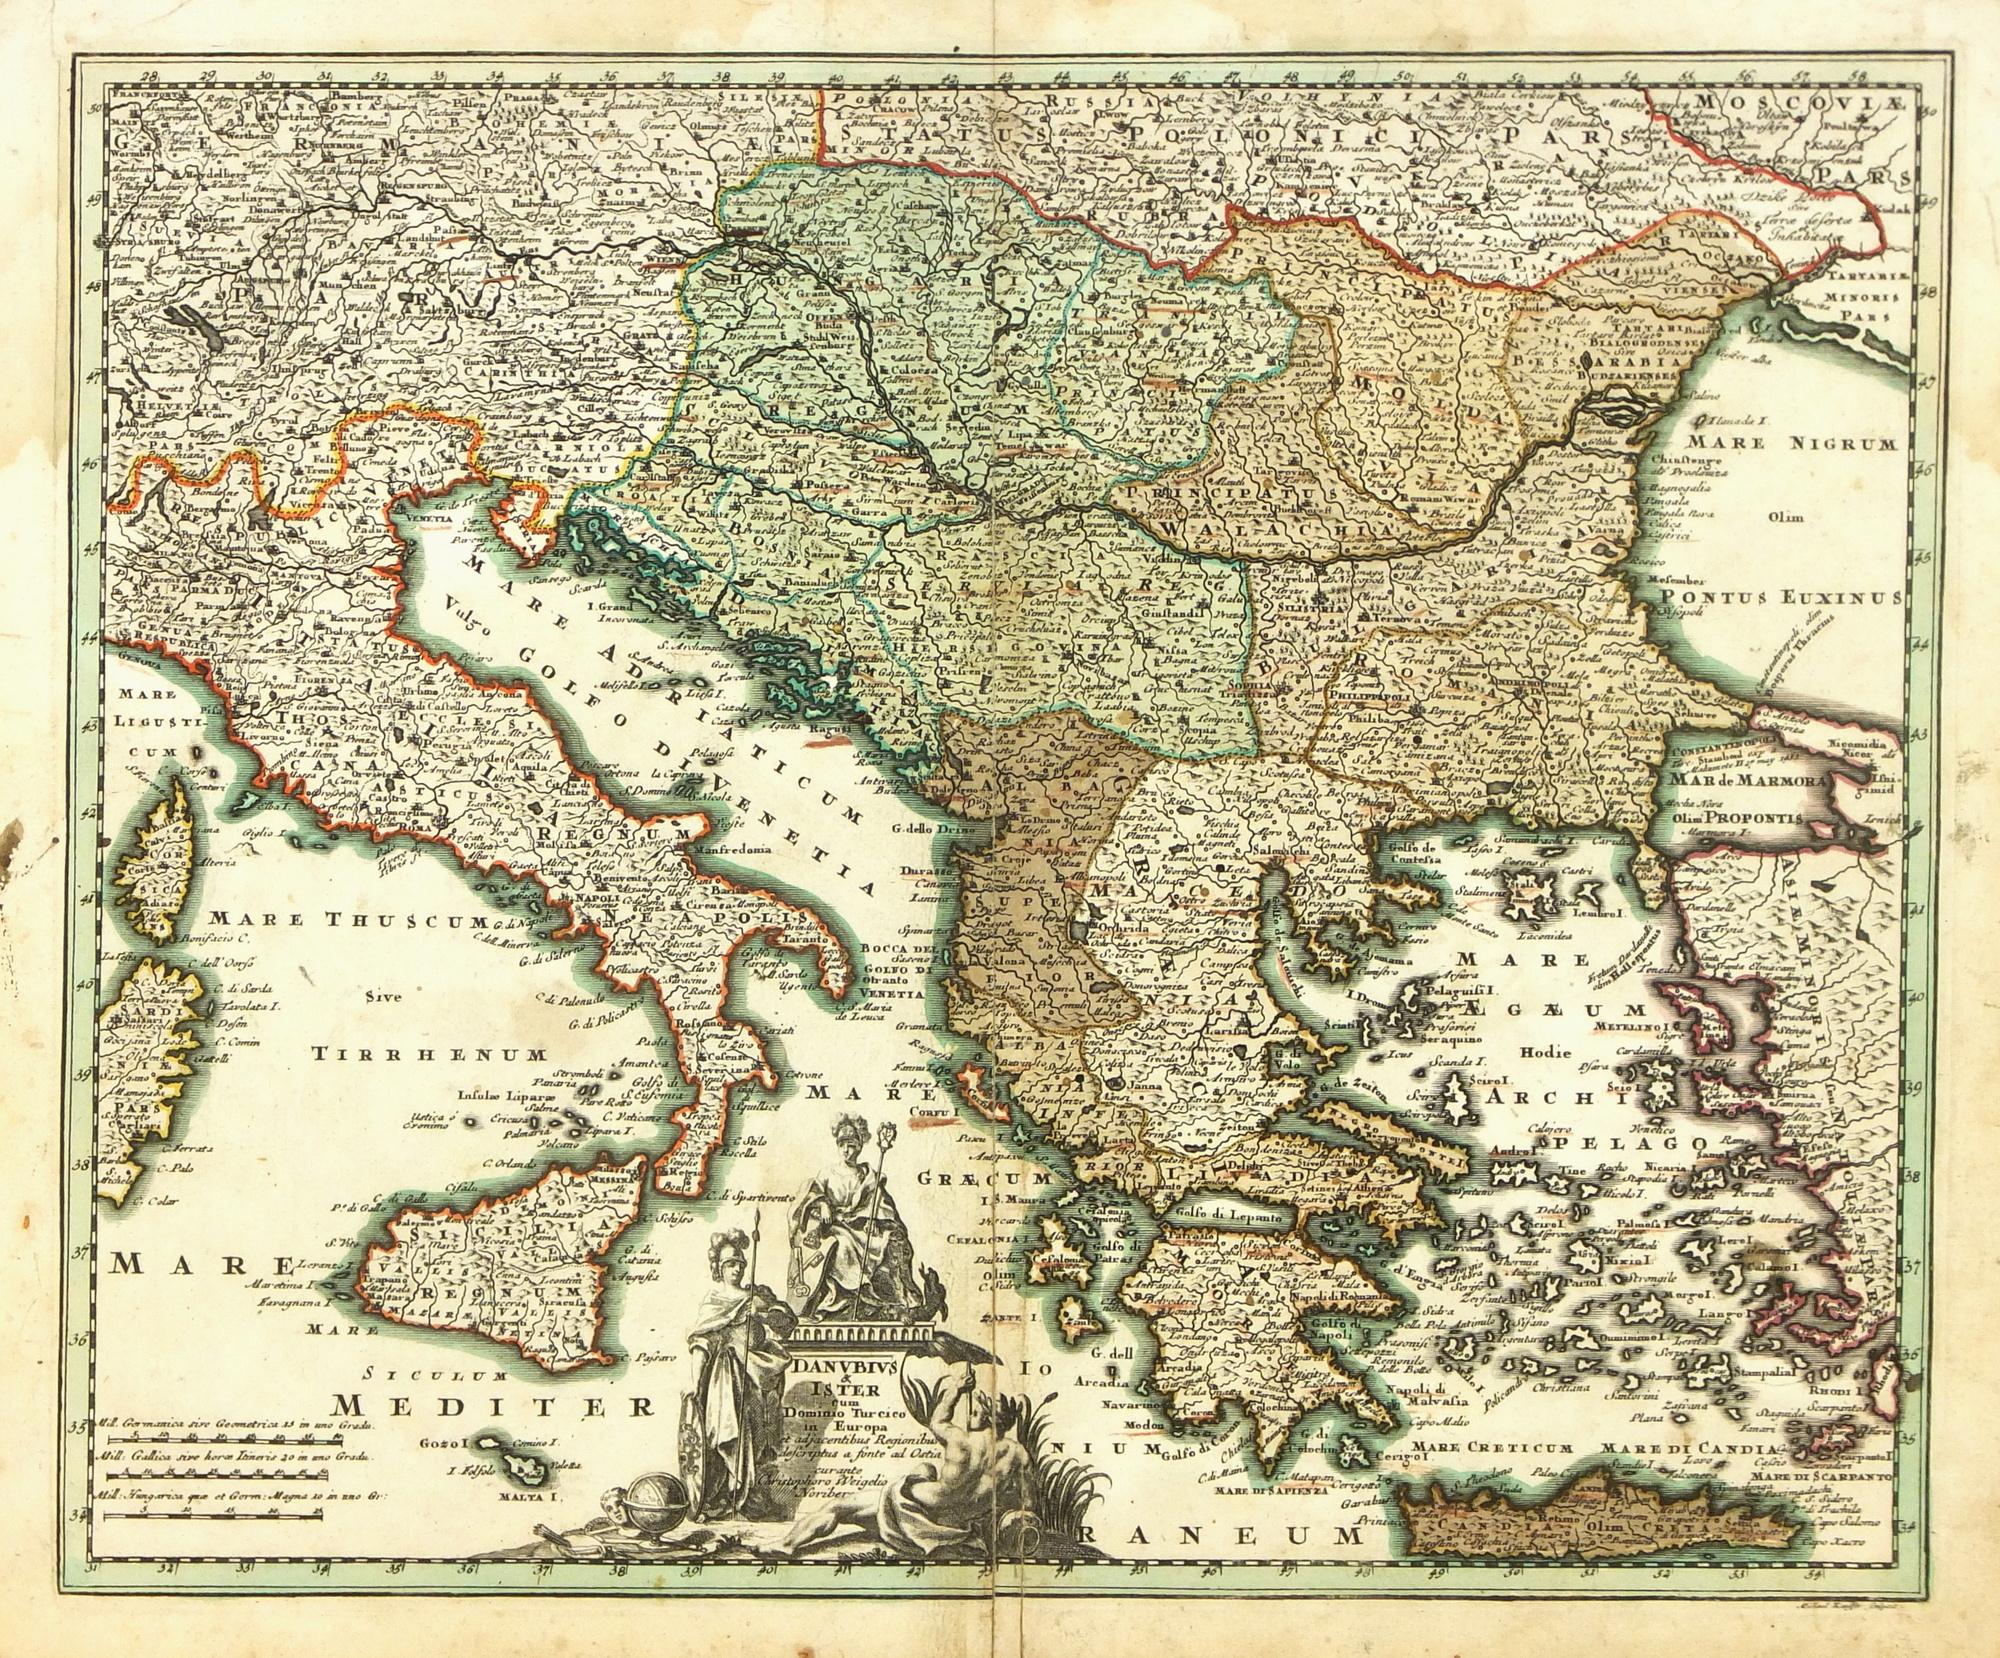 Map of Italy to Greece, 1724 - Original Art, Antique Maps & Prints